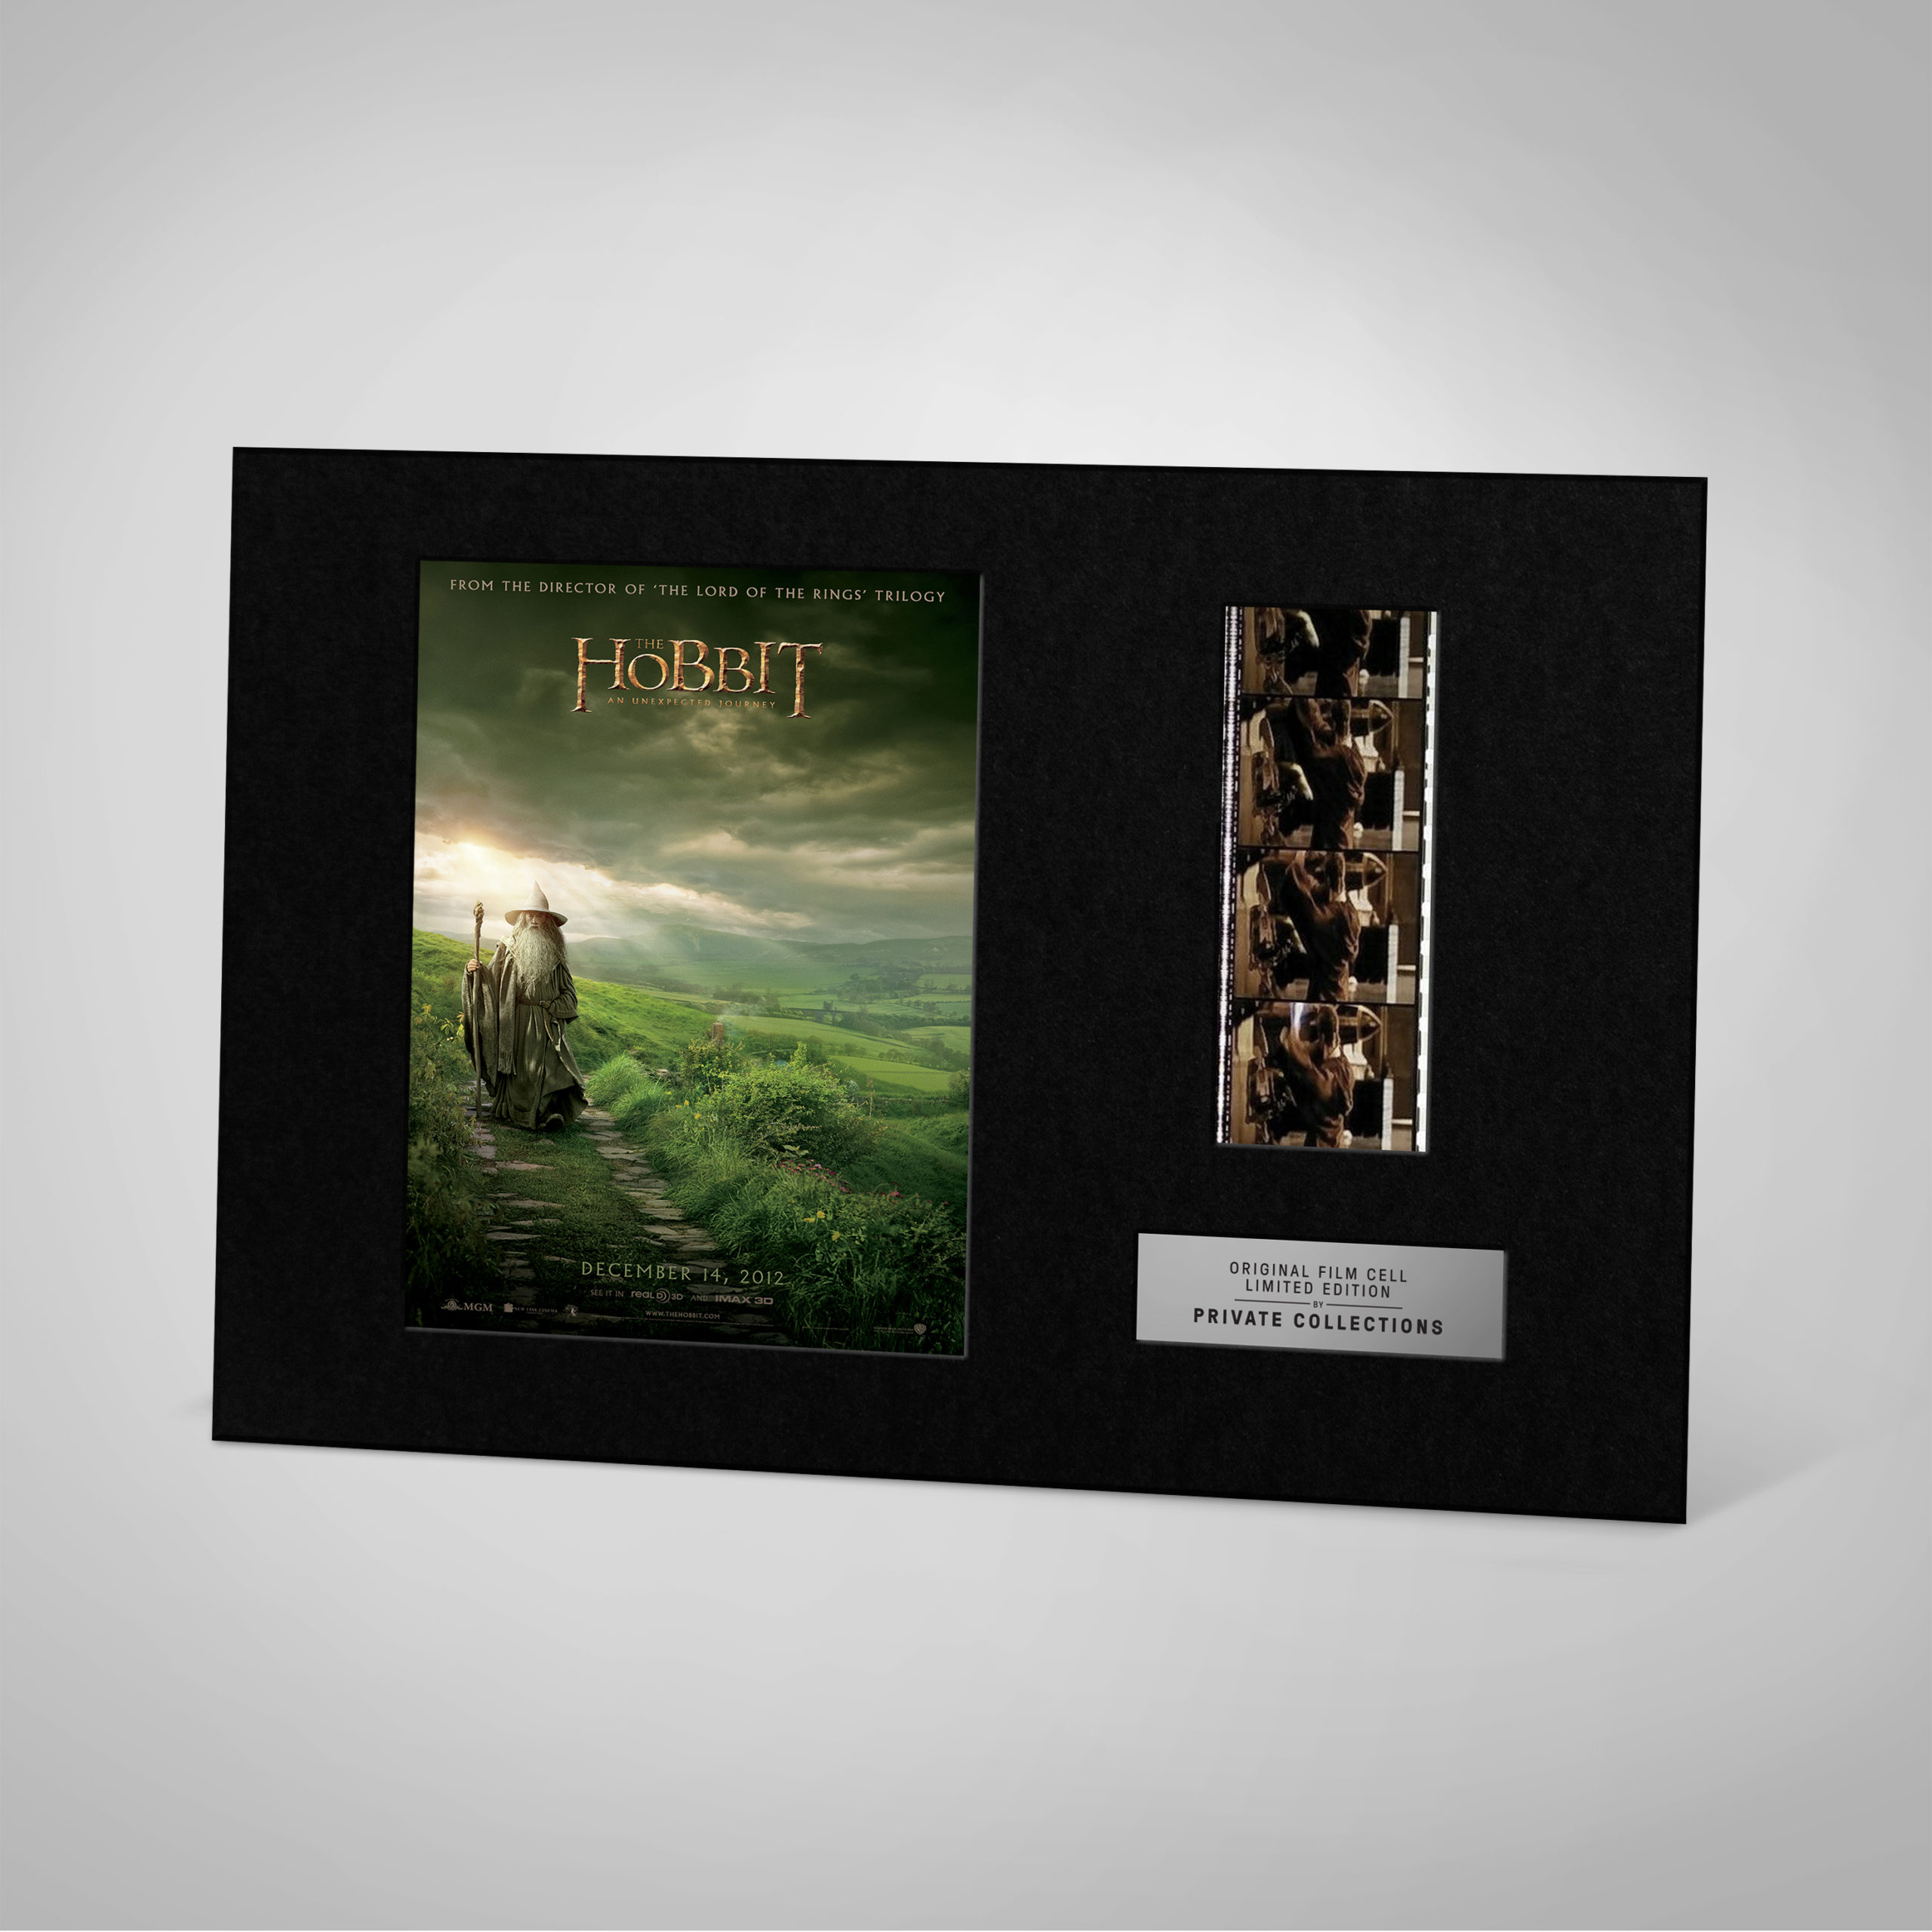 HOBBIT - AN UNEXPECTED JOURNEY (2012) - v.1